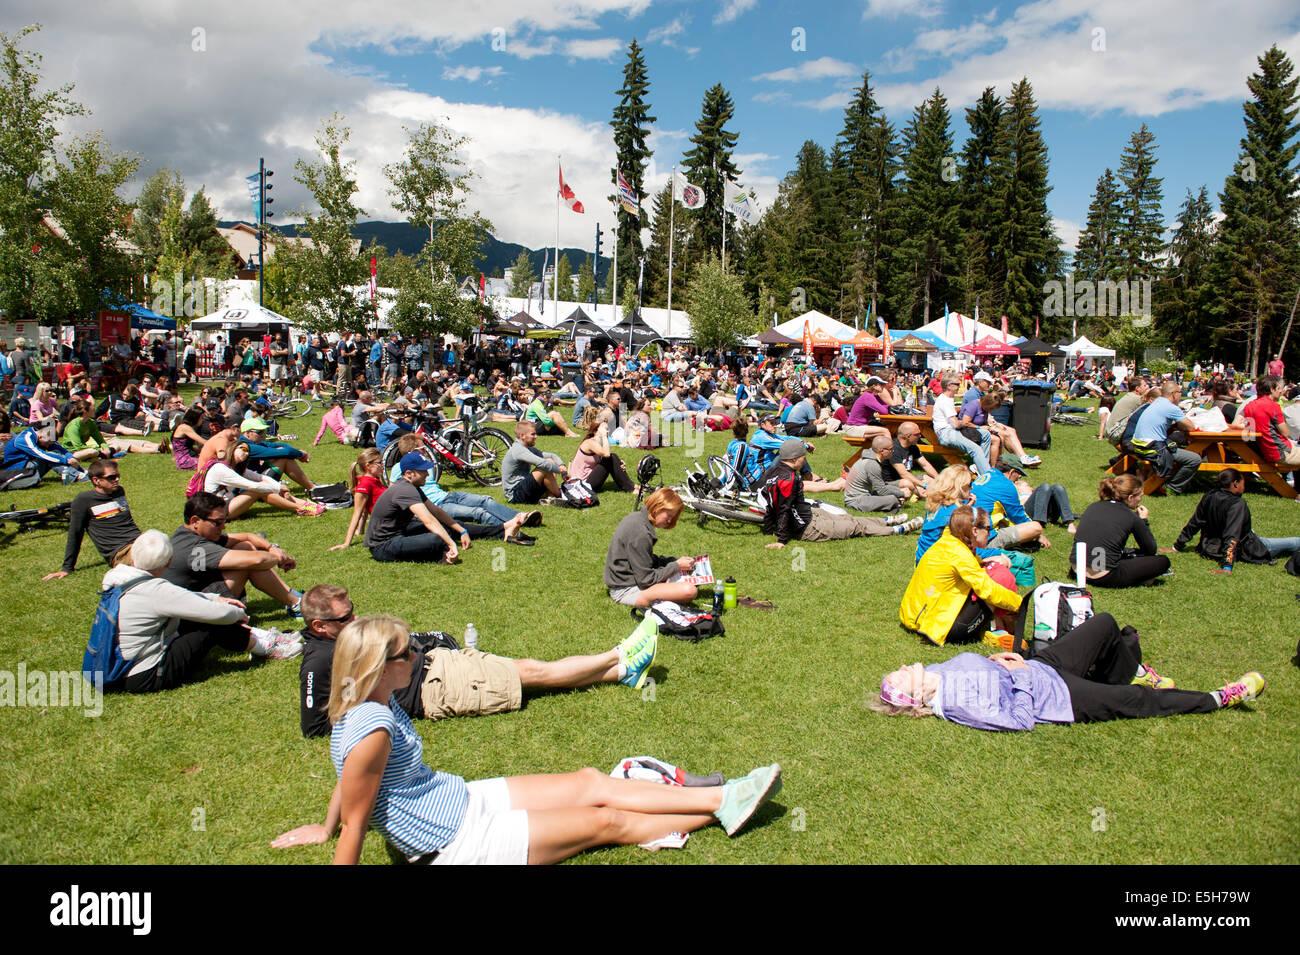 2014 Canadian Ironman race finish area. - Stock Image